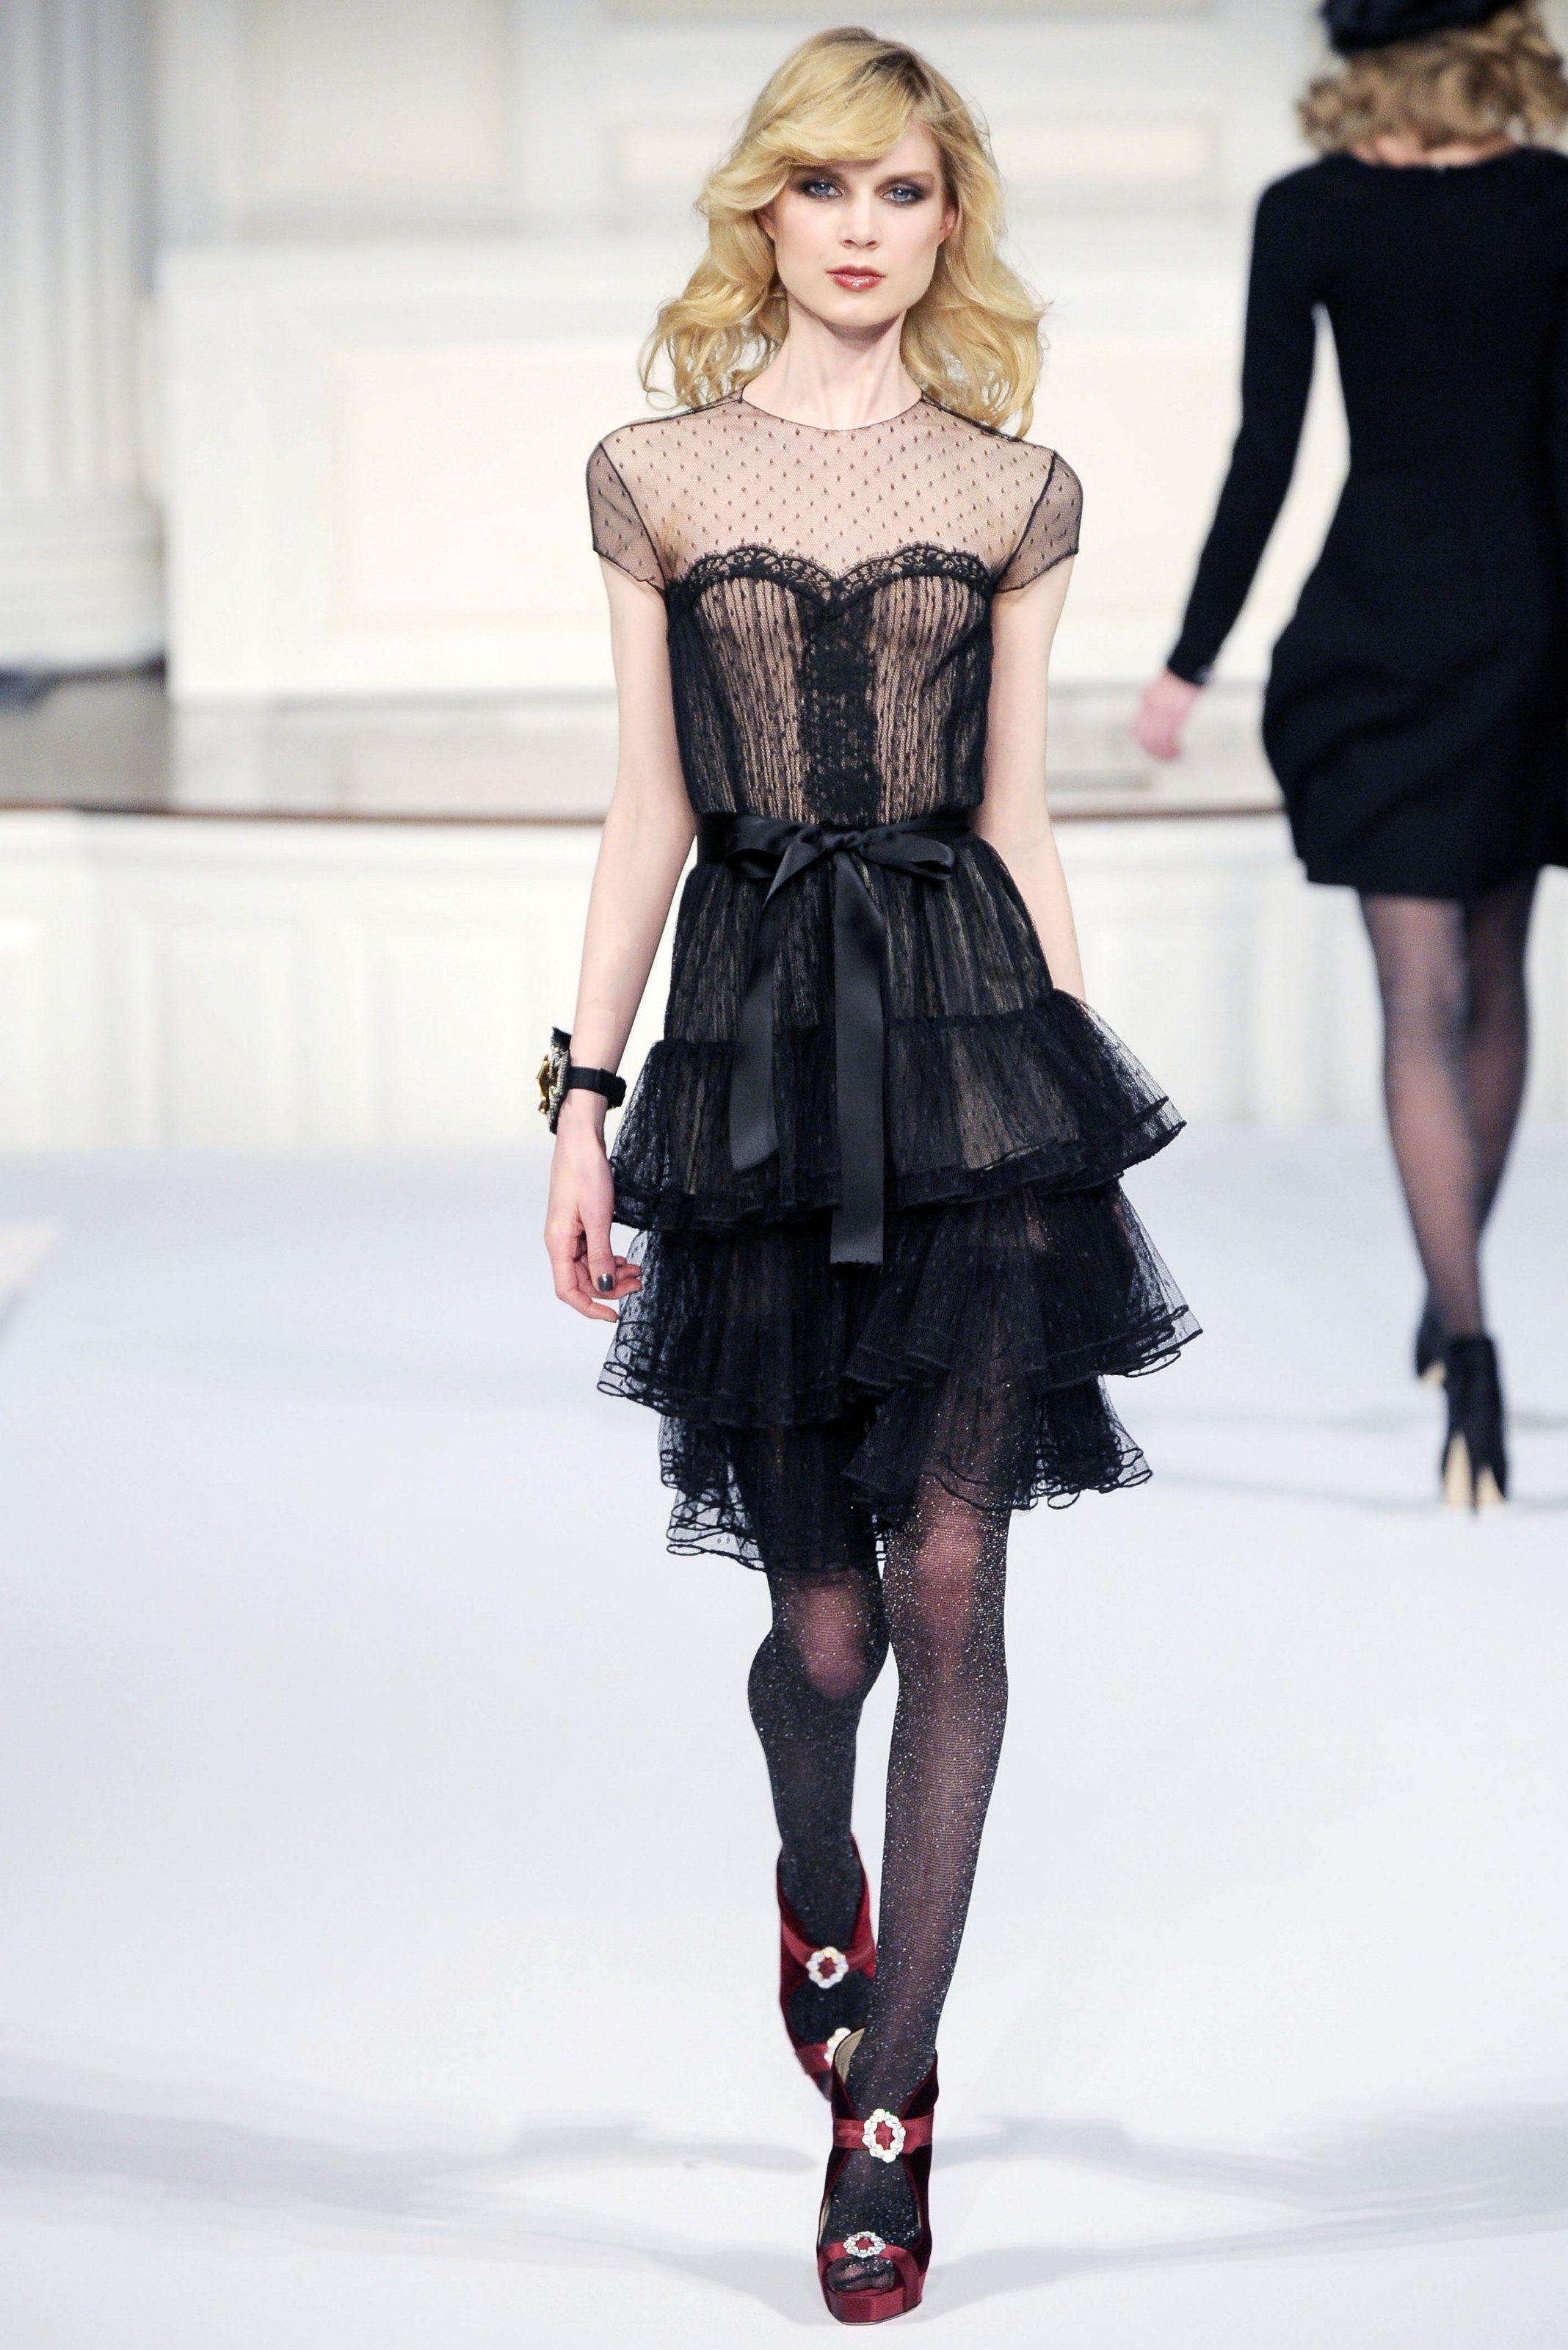 Sfilata Oscar de la Renta New York - Collezioni Autunno Inverno 2010/2011 - Vogue